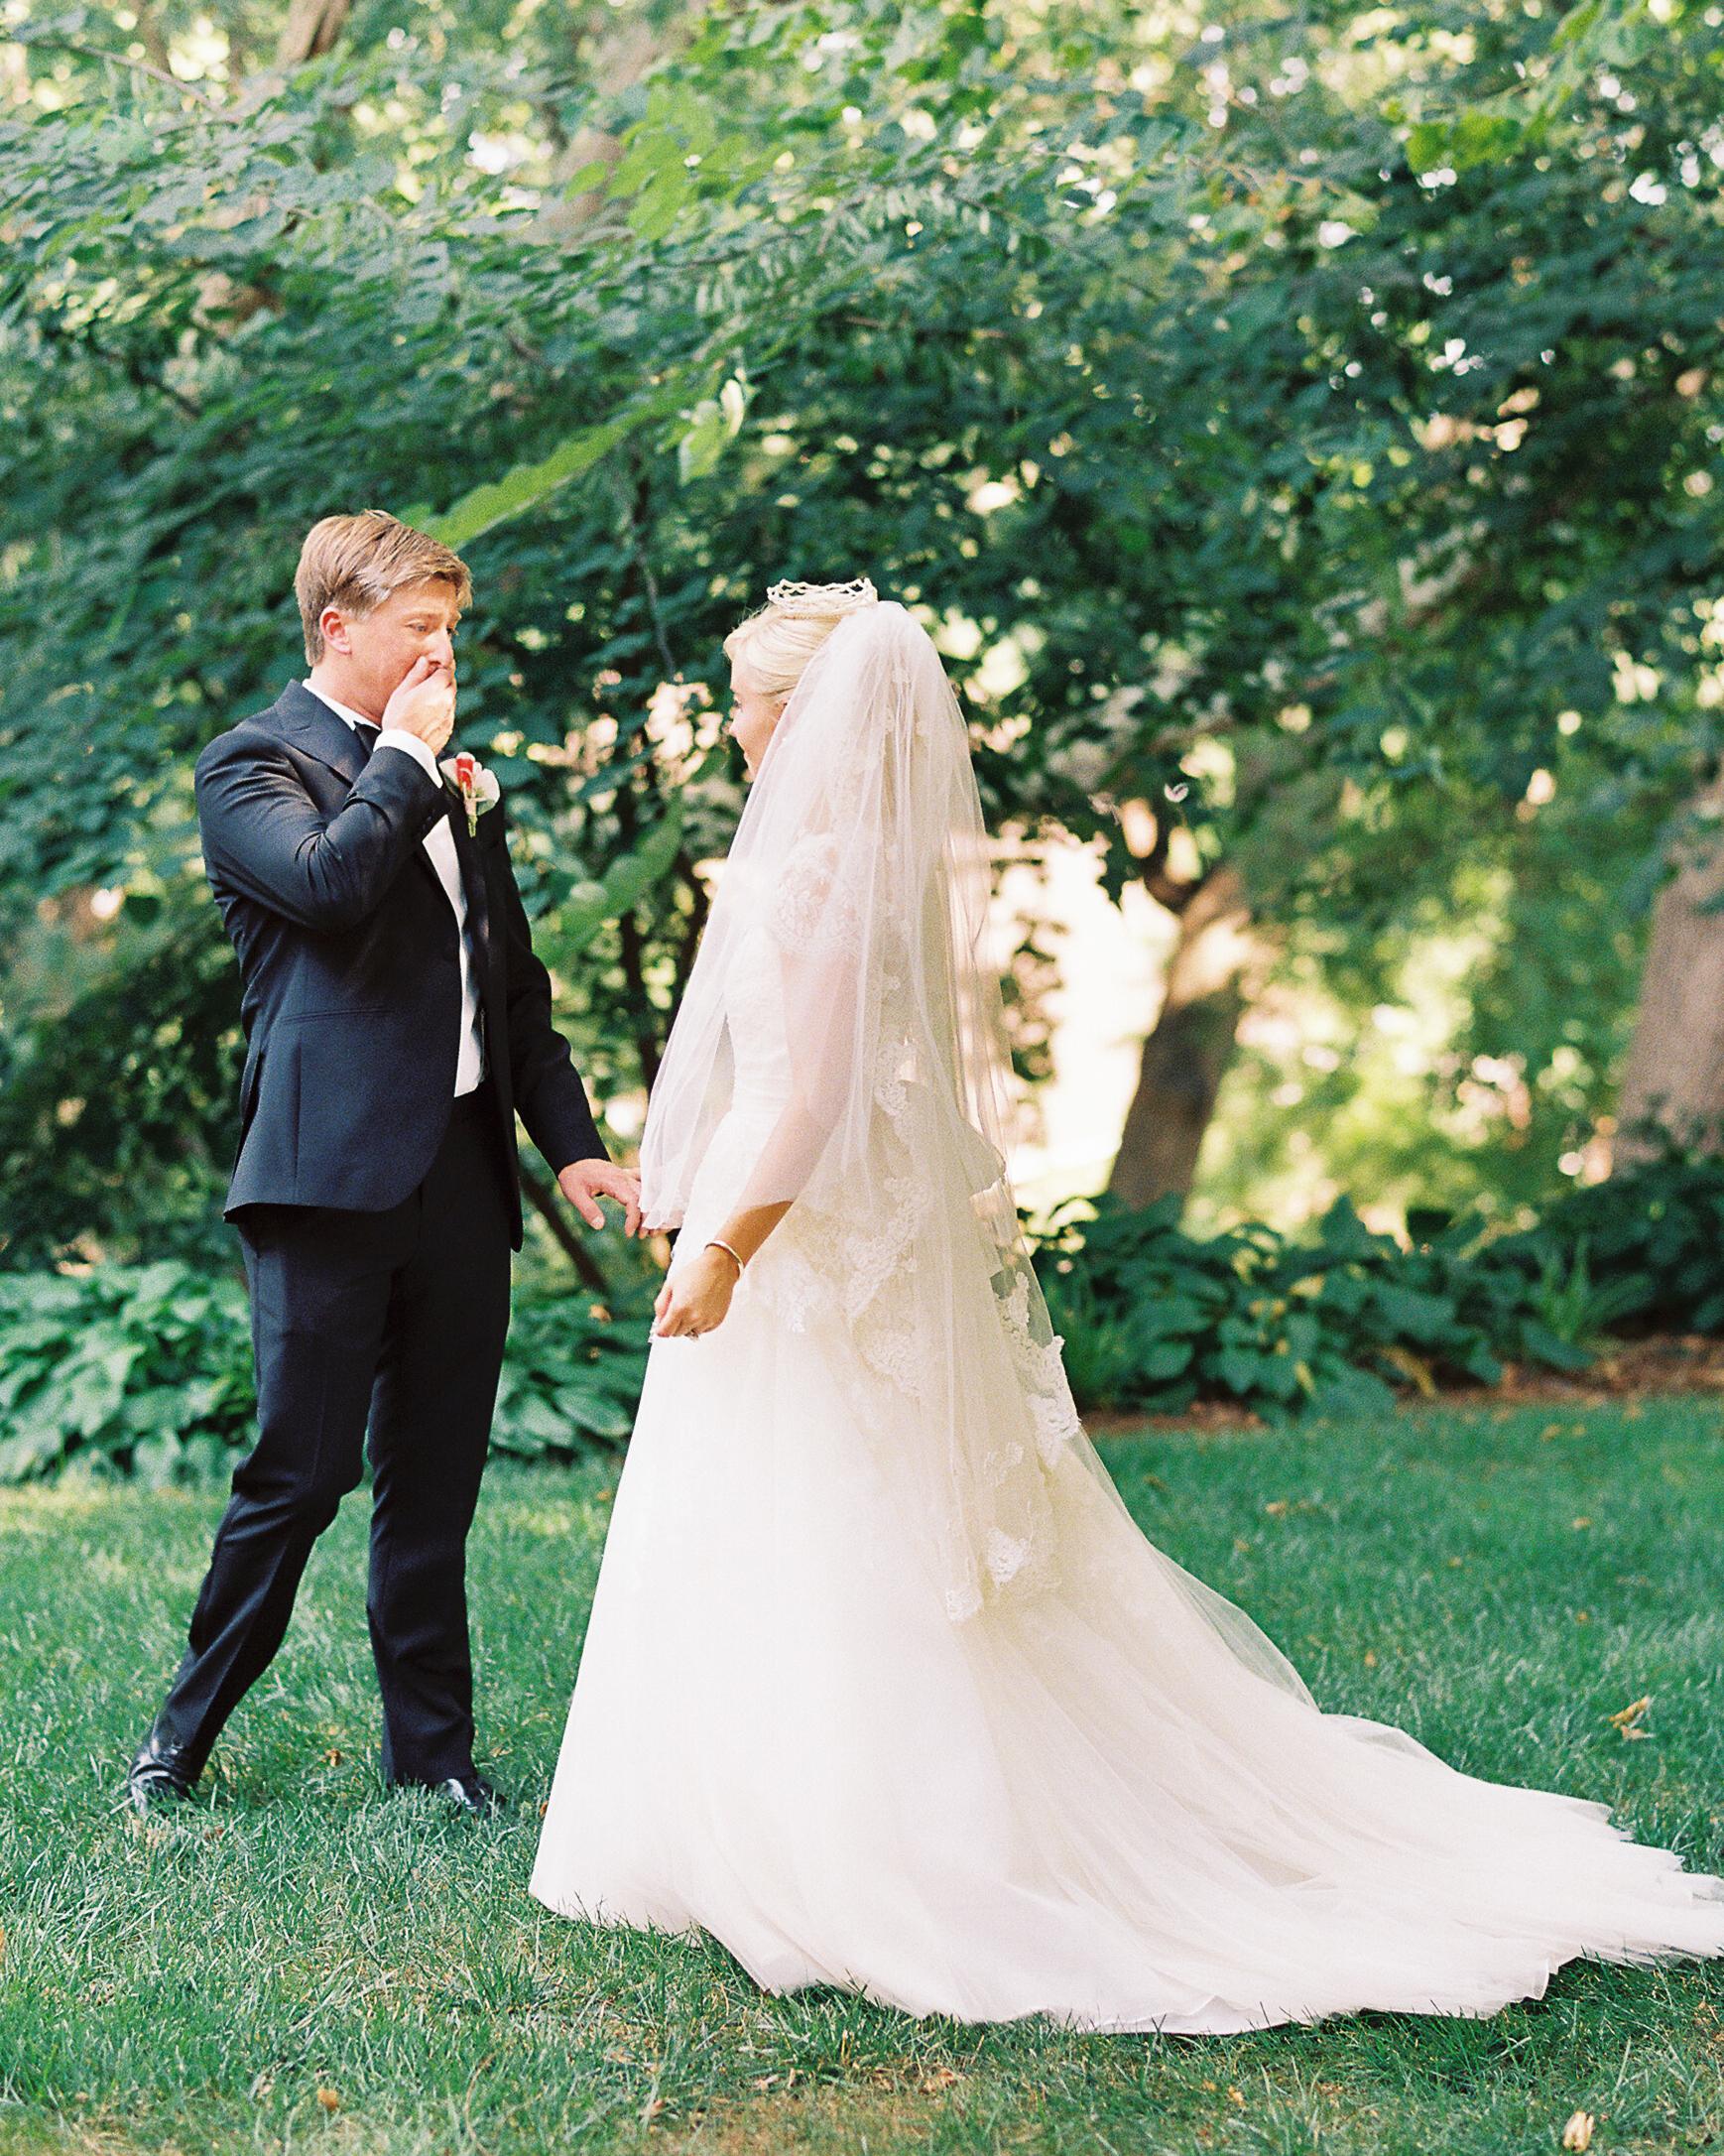 molly-patrick-wedding-firstlook-3094-s111760-0115.jpg